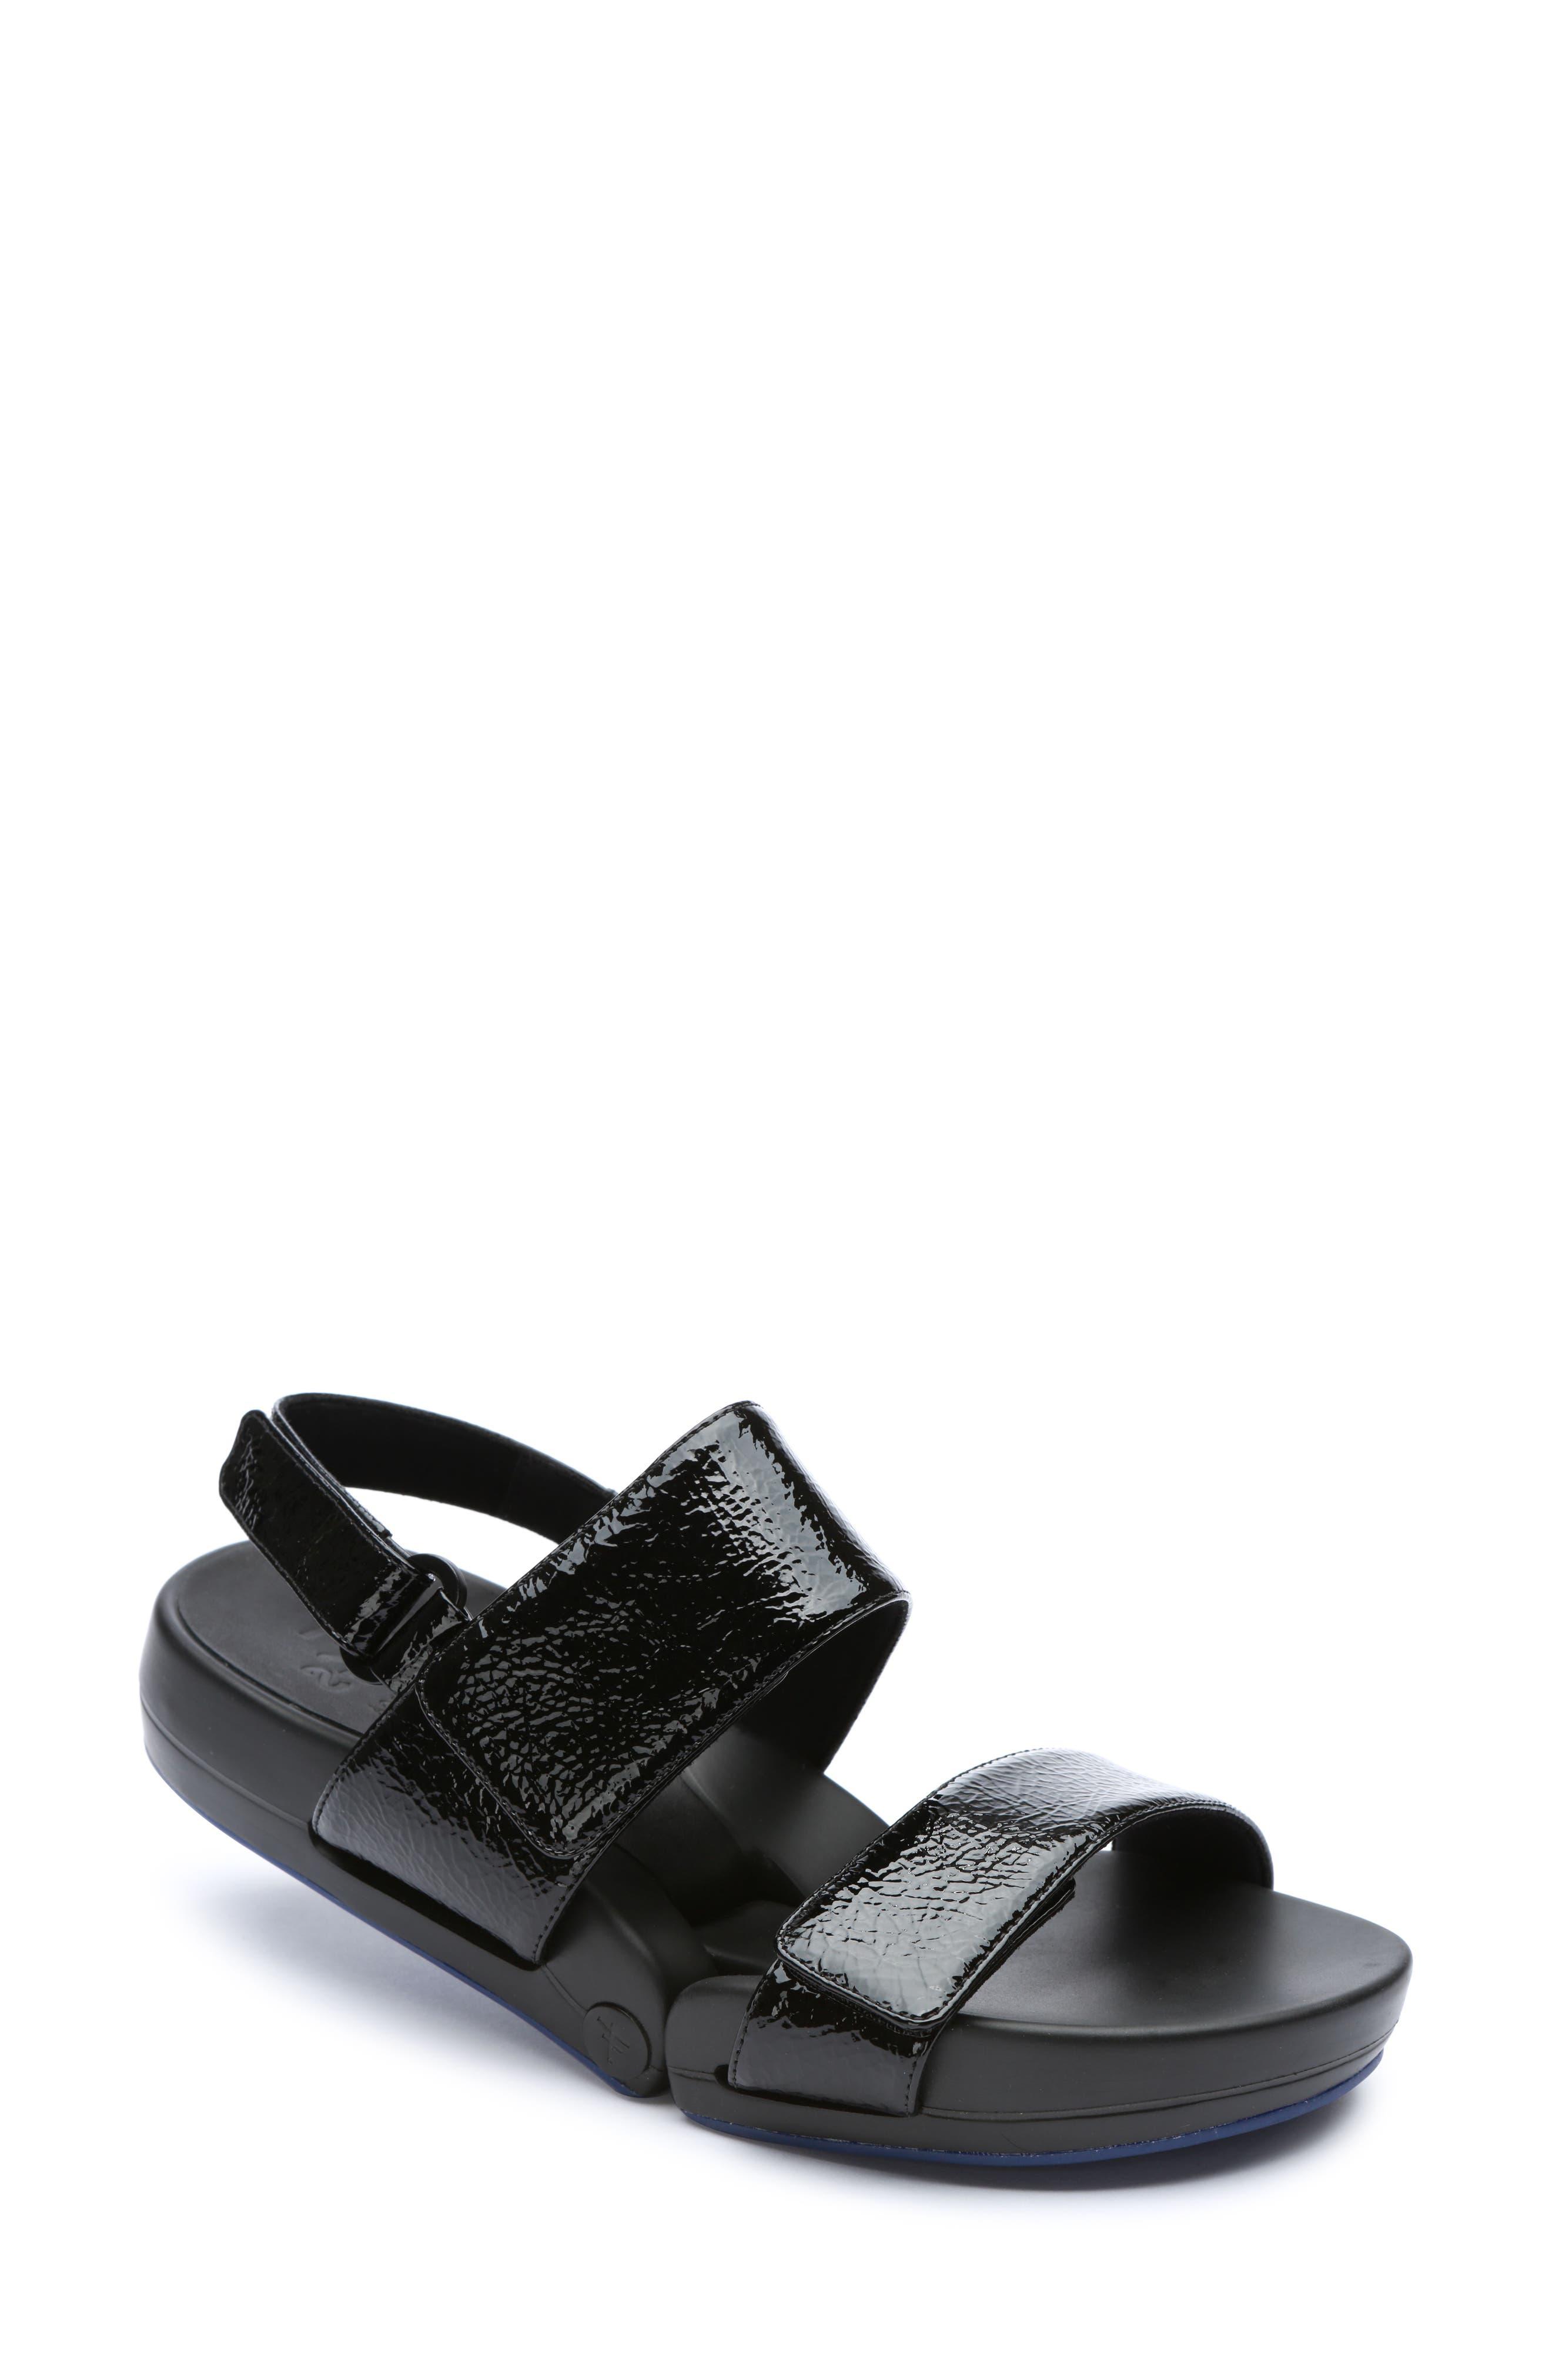 Figulous Sandal,                             Main thumbnail 1, color,                             BLACK CRINKLE PATENT LEATHER